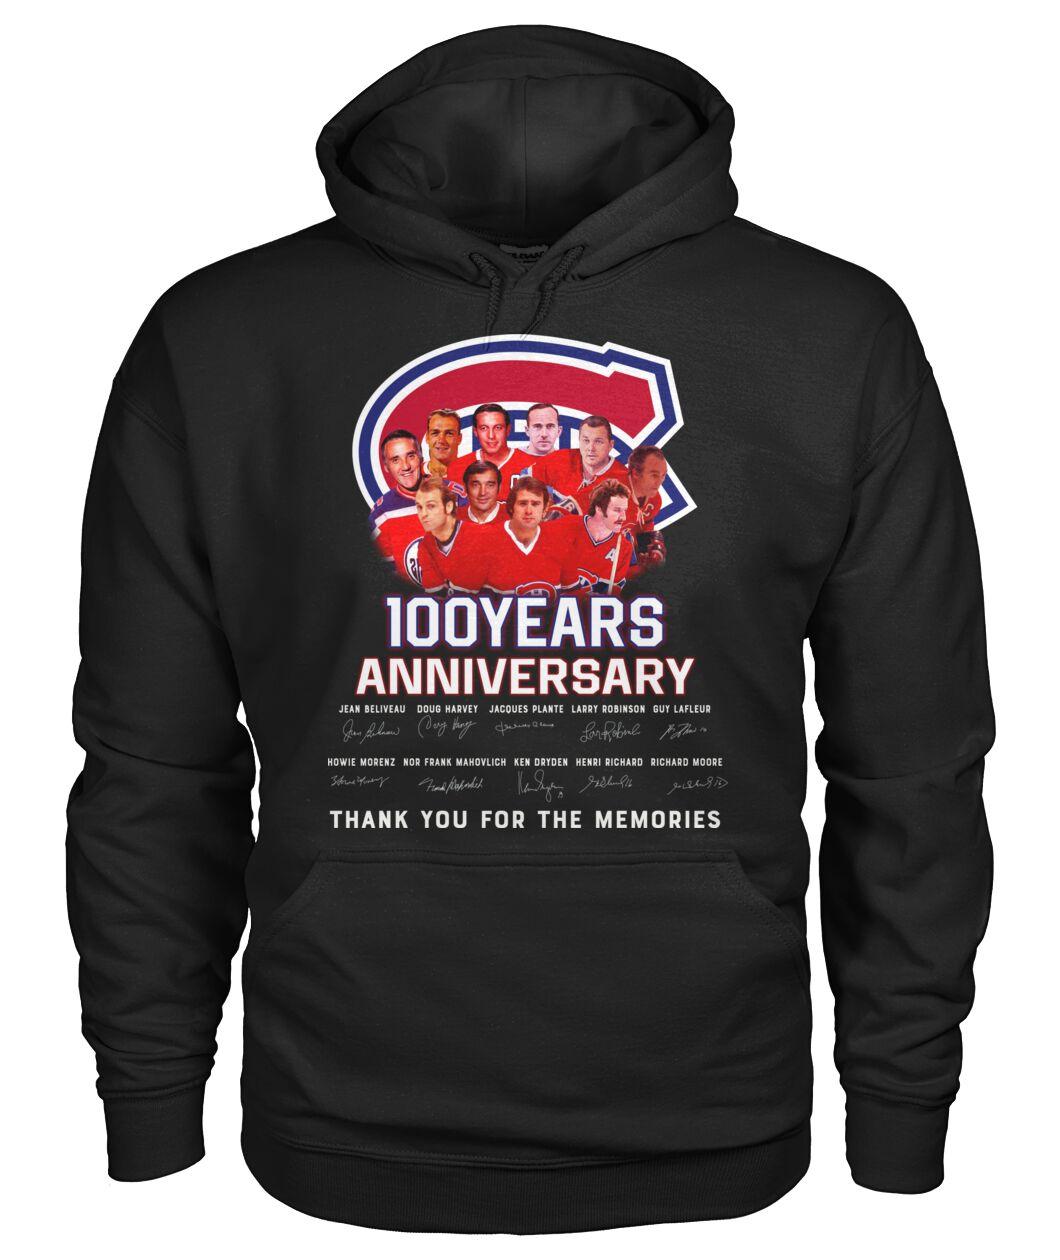 Montreal Canadiens 100 Years anniversary hoodie